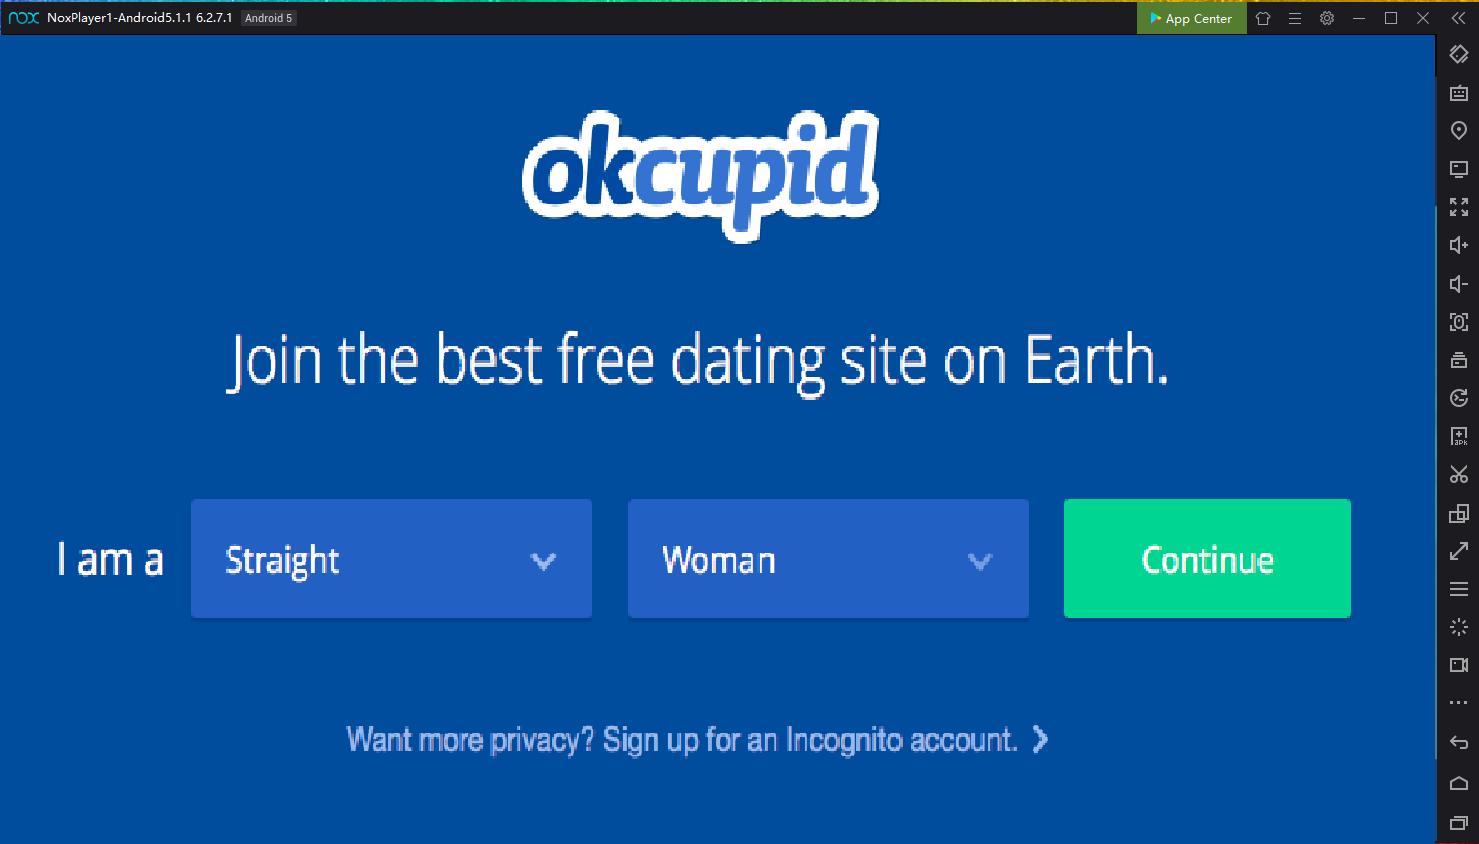 Best match.com payment options